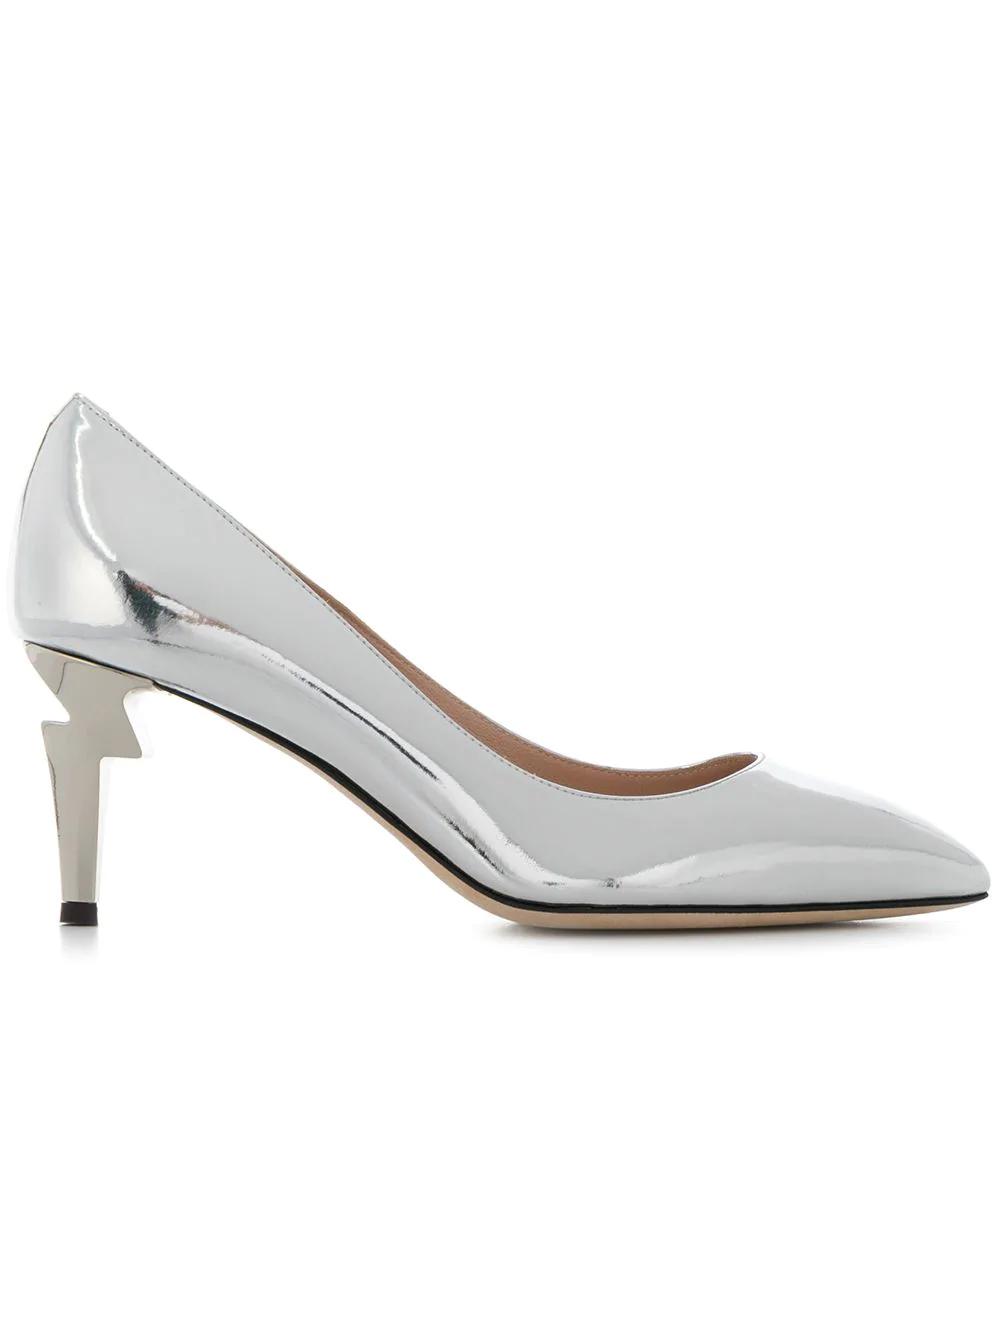 90e082182ab36 Giuseppe Zanotti Sculpted Heel Pumps - Silver | ModeSens